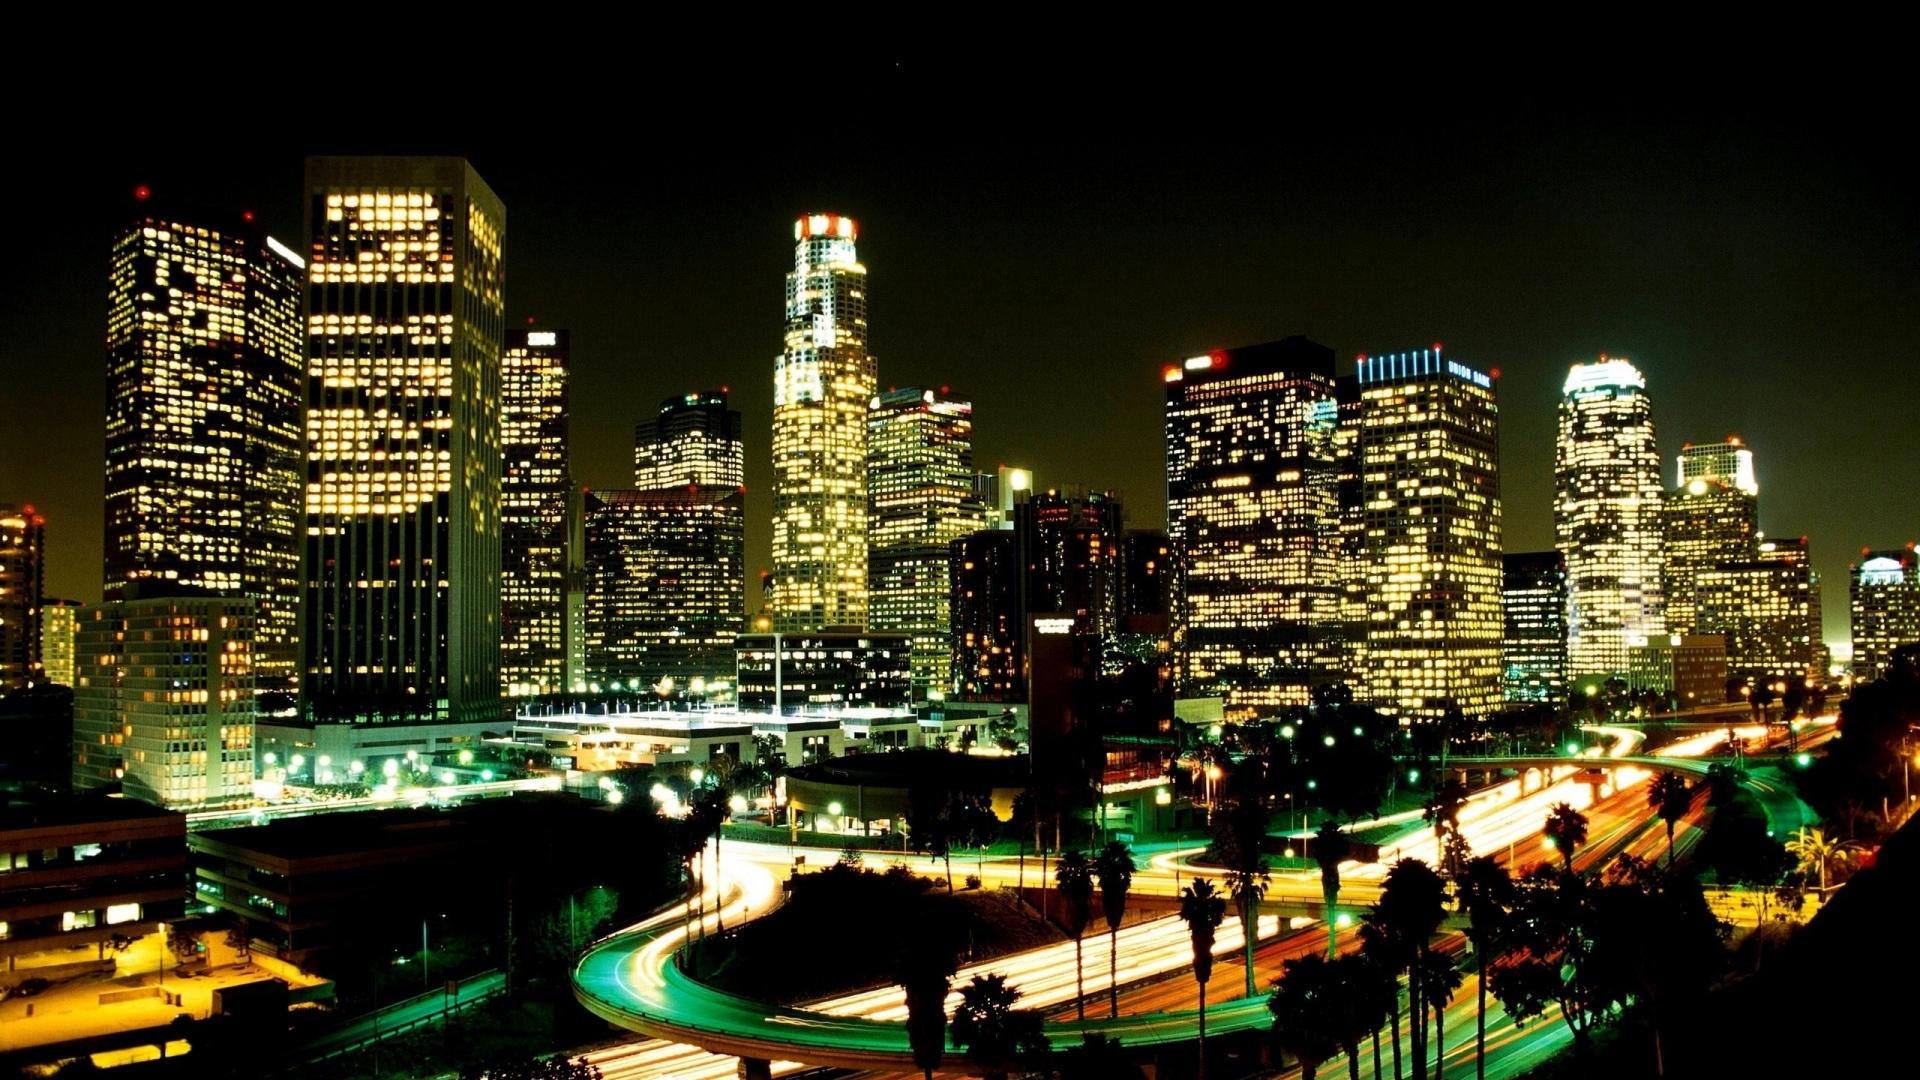 los angeles city night street skyscrapers Full HD 1080p HD 1920x1080